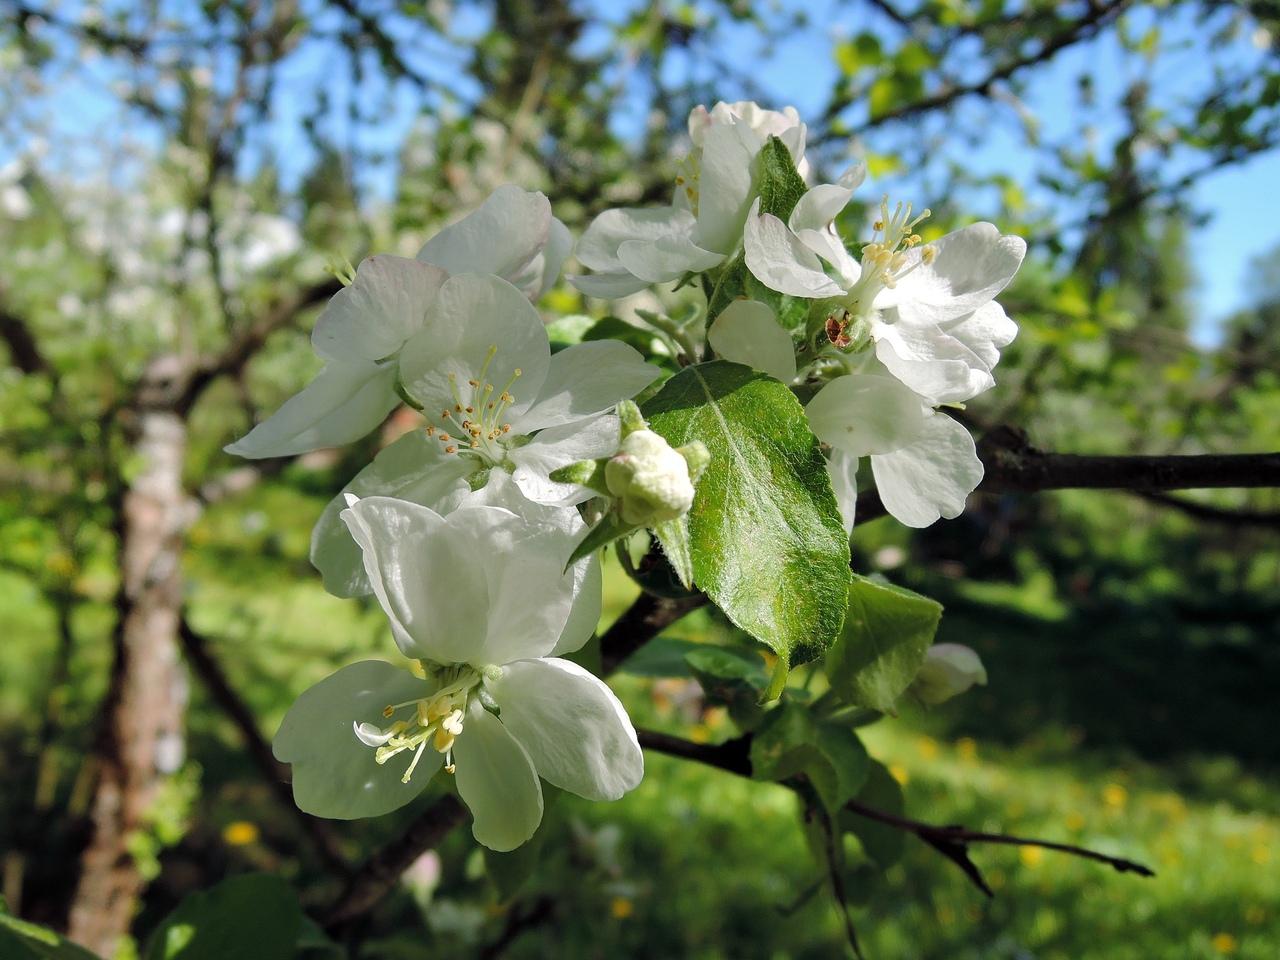 яблоневый цвет